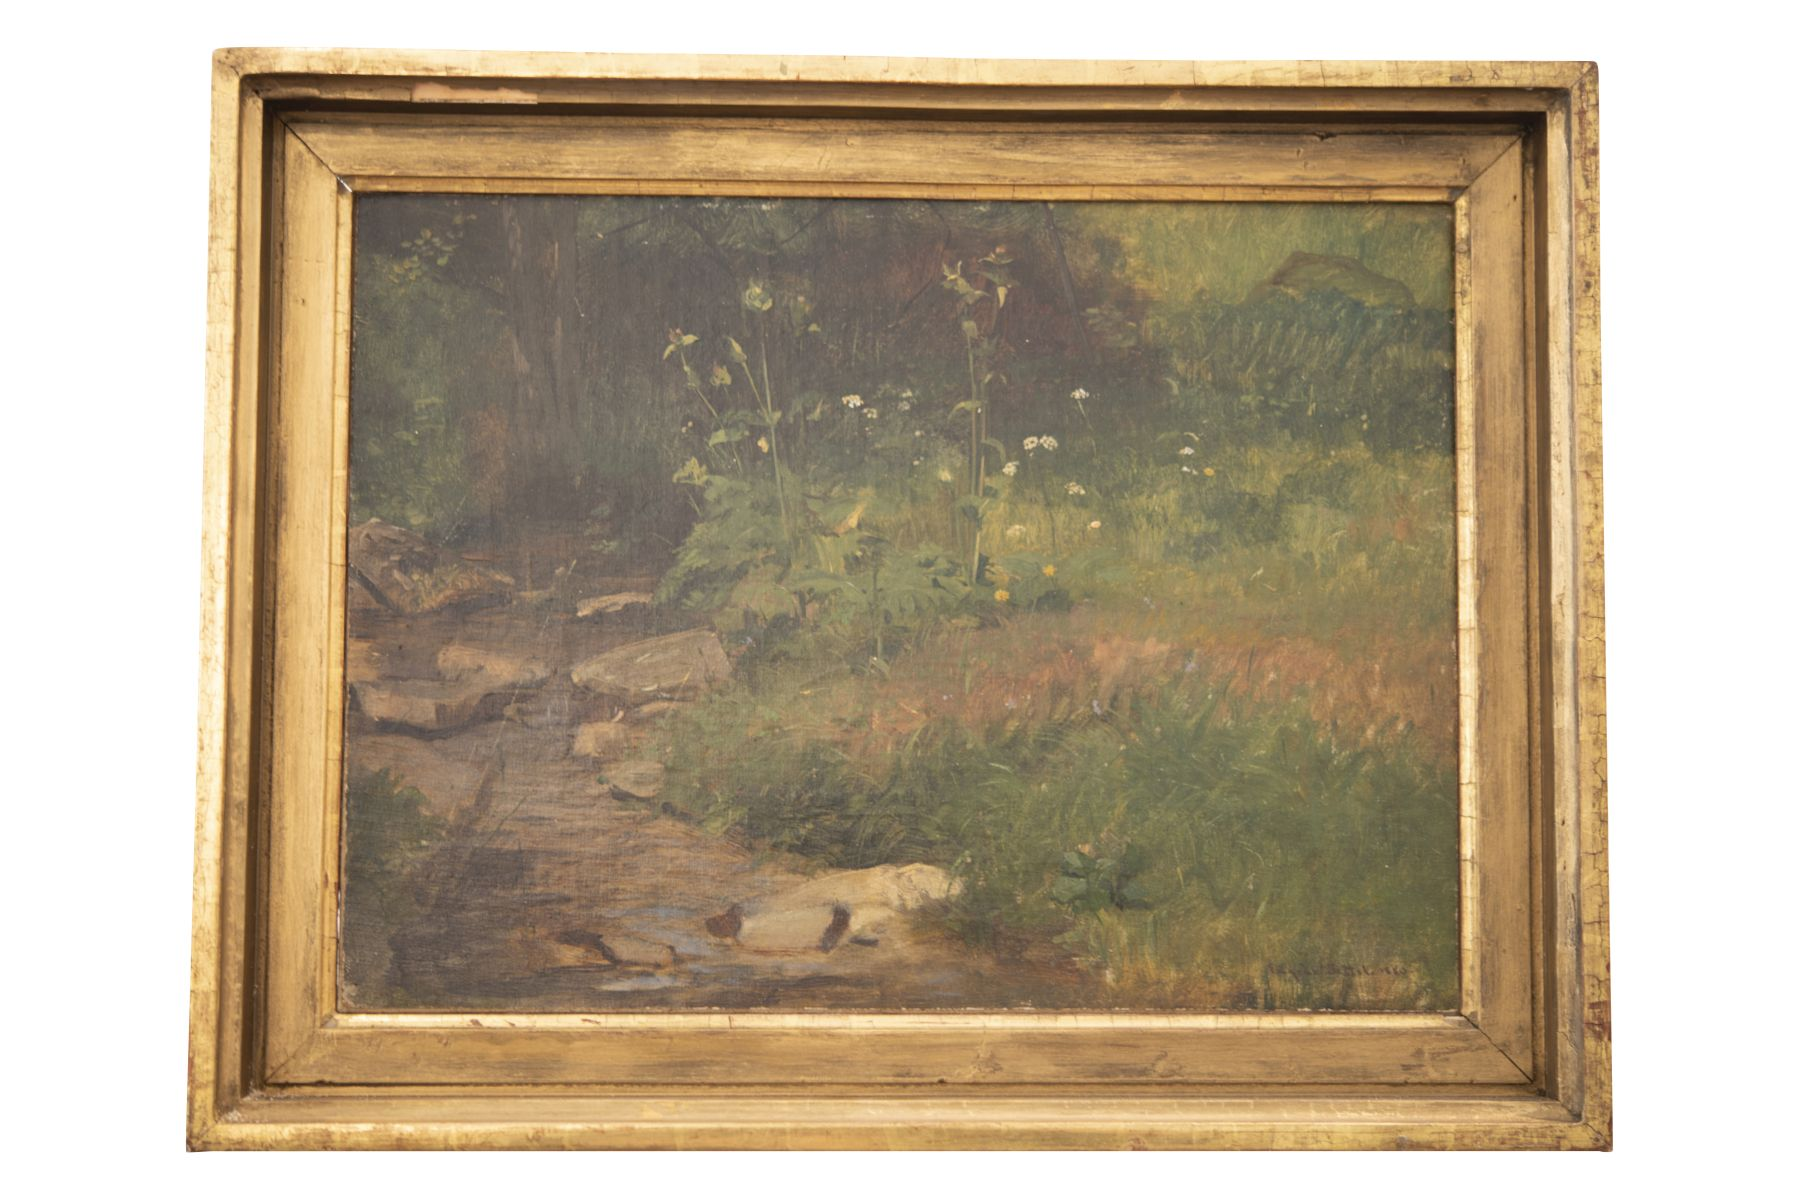 #148 Eugen Jettel (1845–1901), Meadow Landscape with Stream, 1880   Eugen Jettel (1845–1901), Wiesenlandschaft mit Bach, 1880 Image